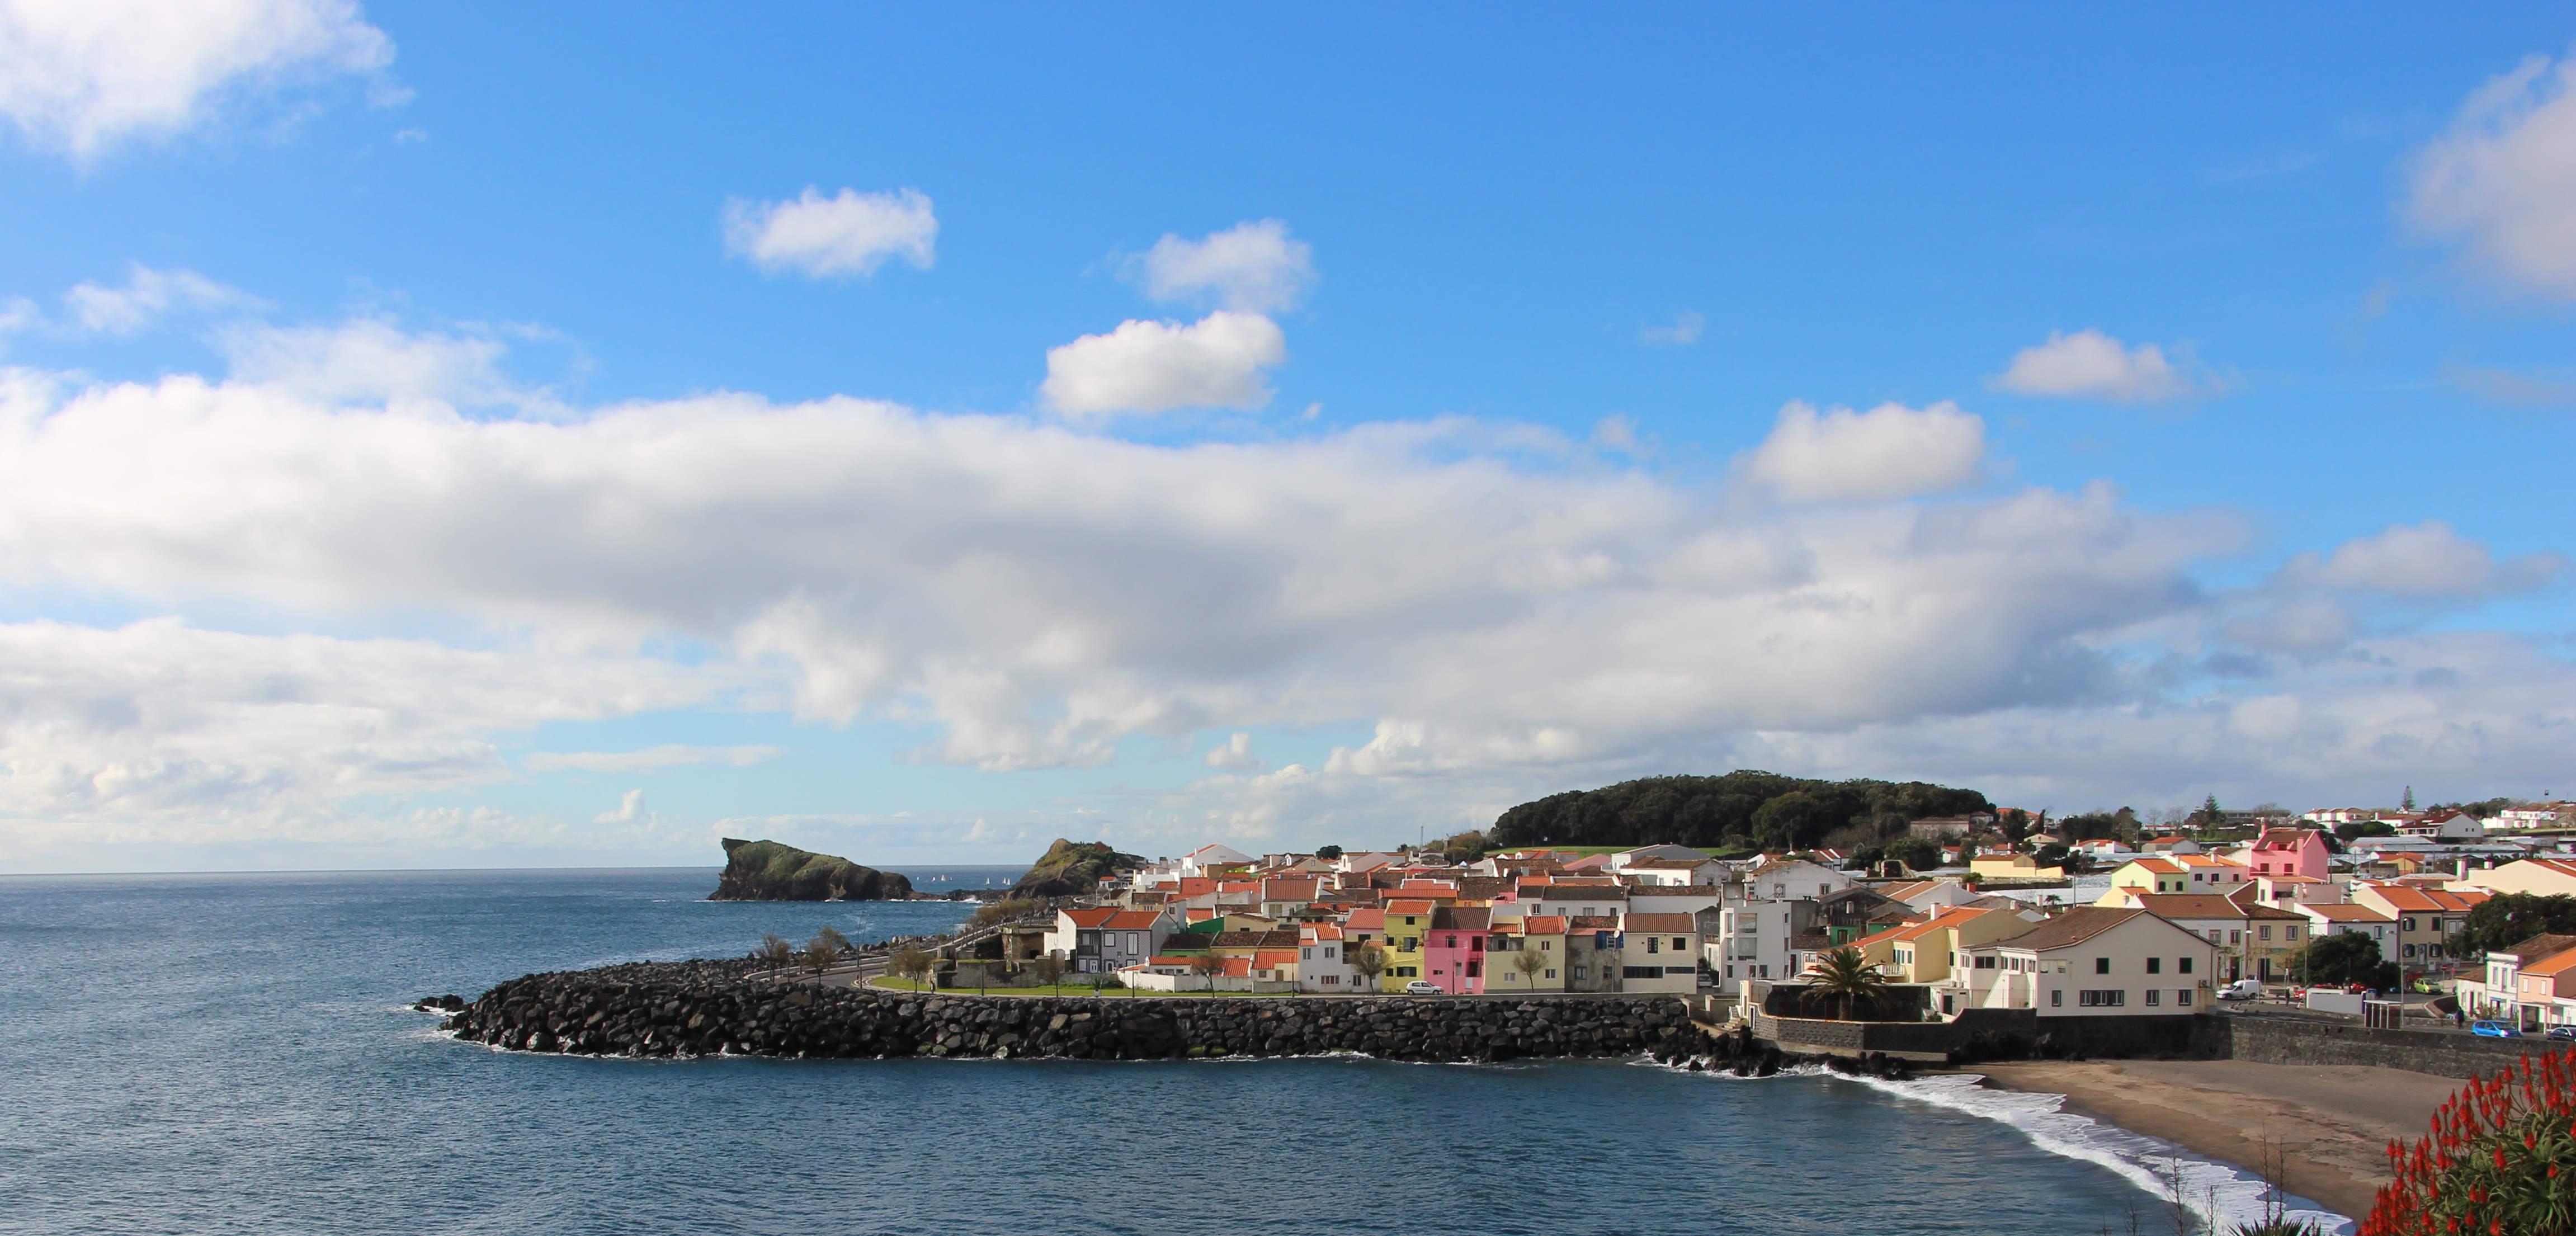 Visiting the Azores, Ponta Delgada View